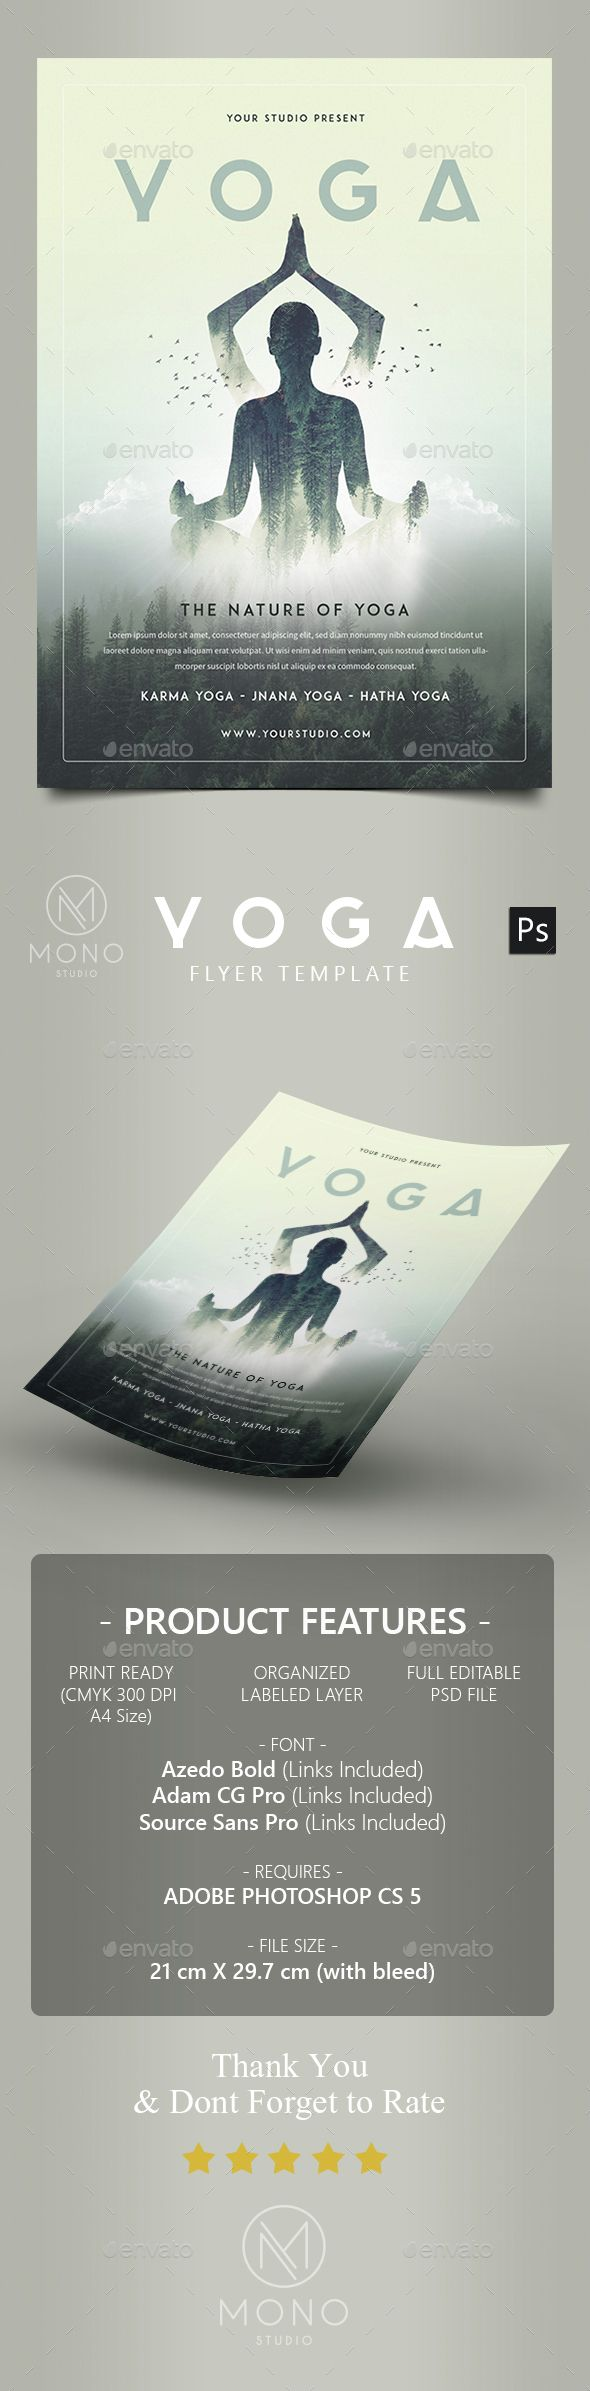 Yoga Flyer   Pinterest   Flyer template, Yoga and Template